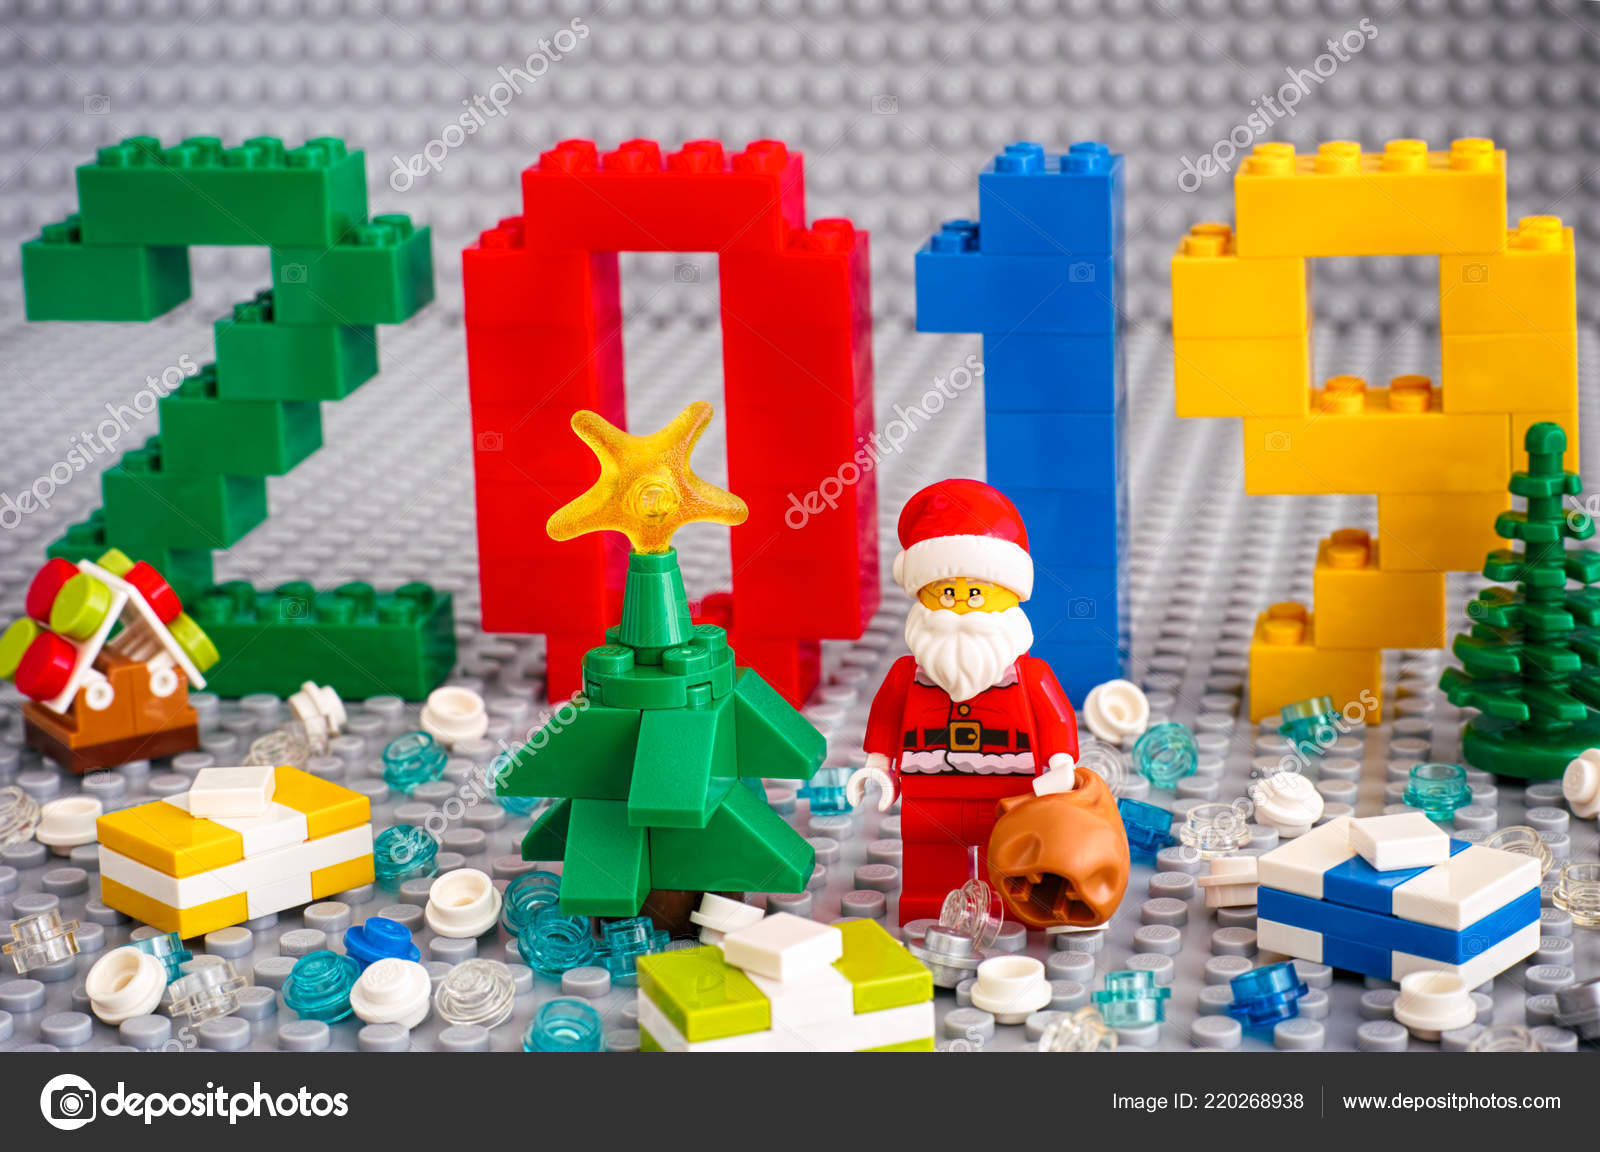 Lego Christmas Set 2019.Tambov Russian Federation September 2018 Numbers 2019 Made